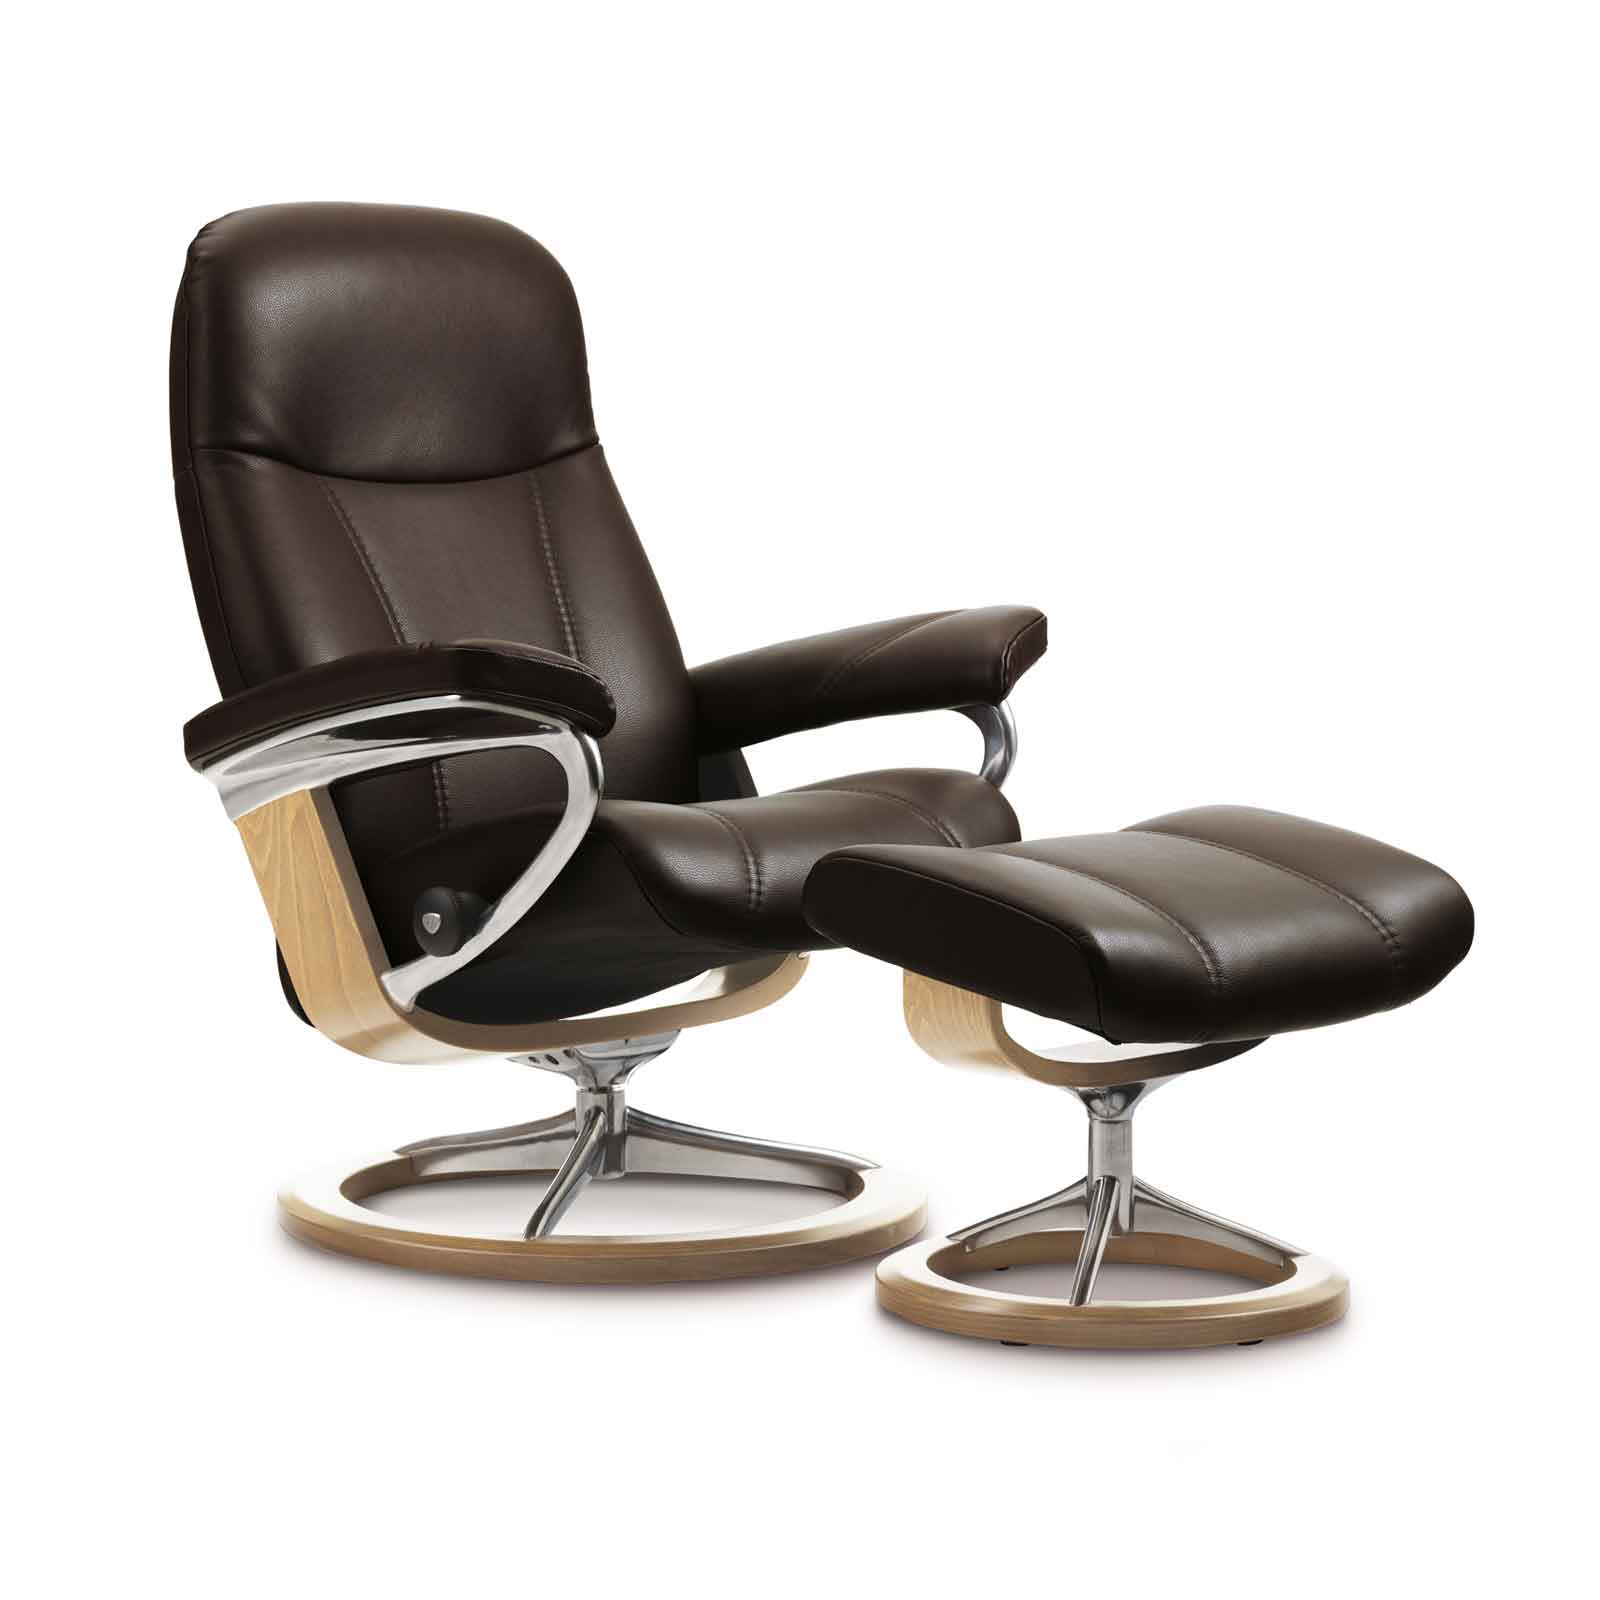 stressless sessel consul batick braun signature gestell mit hocker. Black Bedroom Furniture Sets. Home Design Ideas